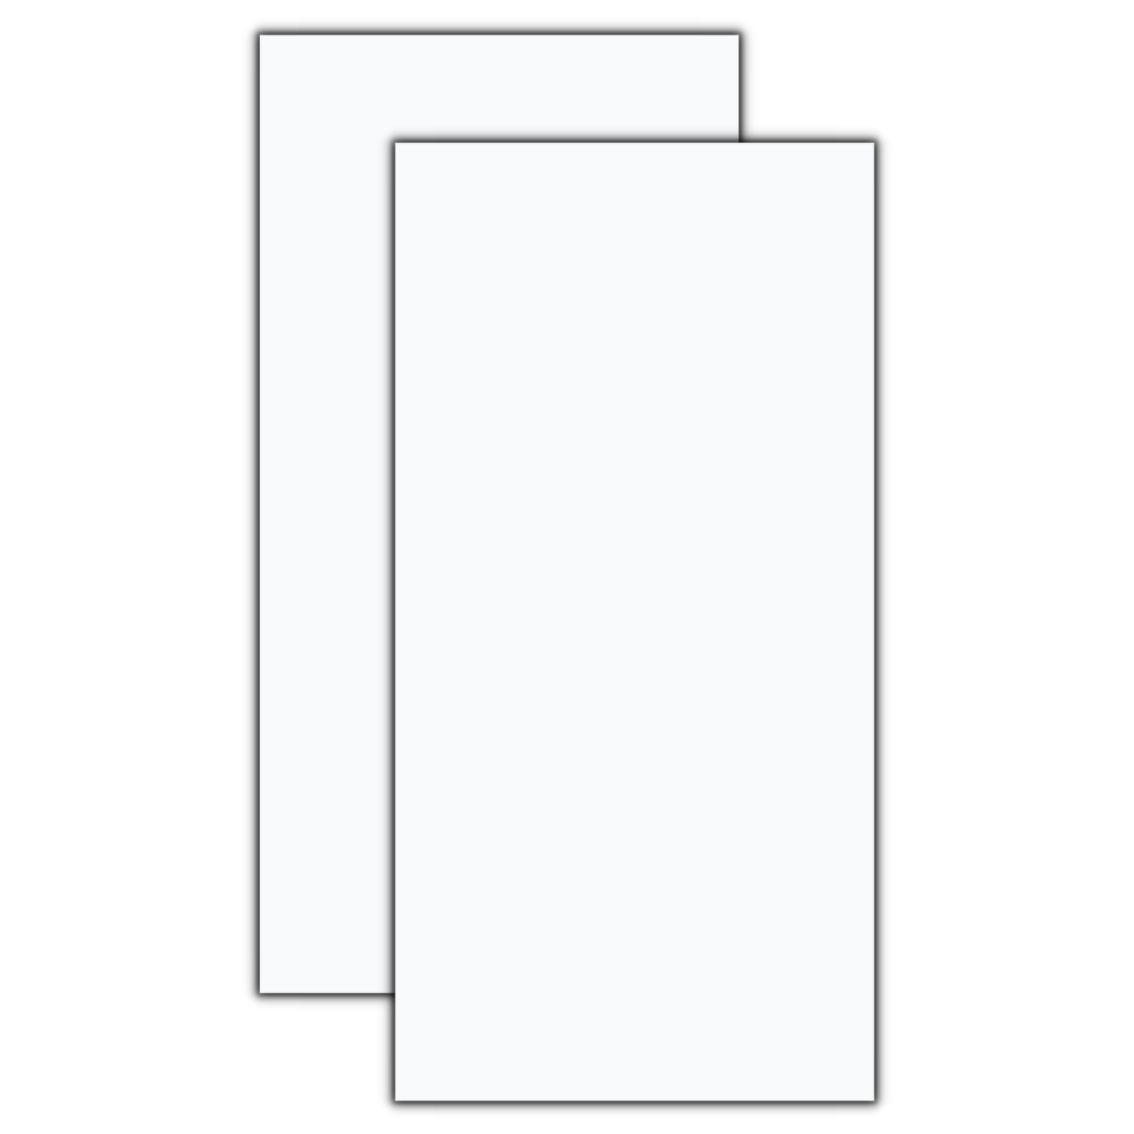 Cotton Polido 63x120 cm <br /><b>R$ 96,00 M² </b><br />Cx 2,27 M² <b> R$ 217,92</b>